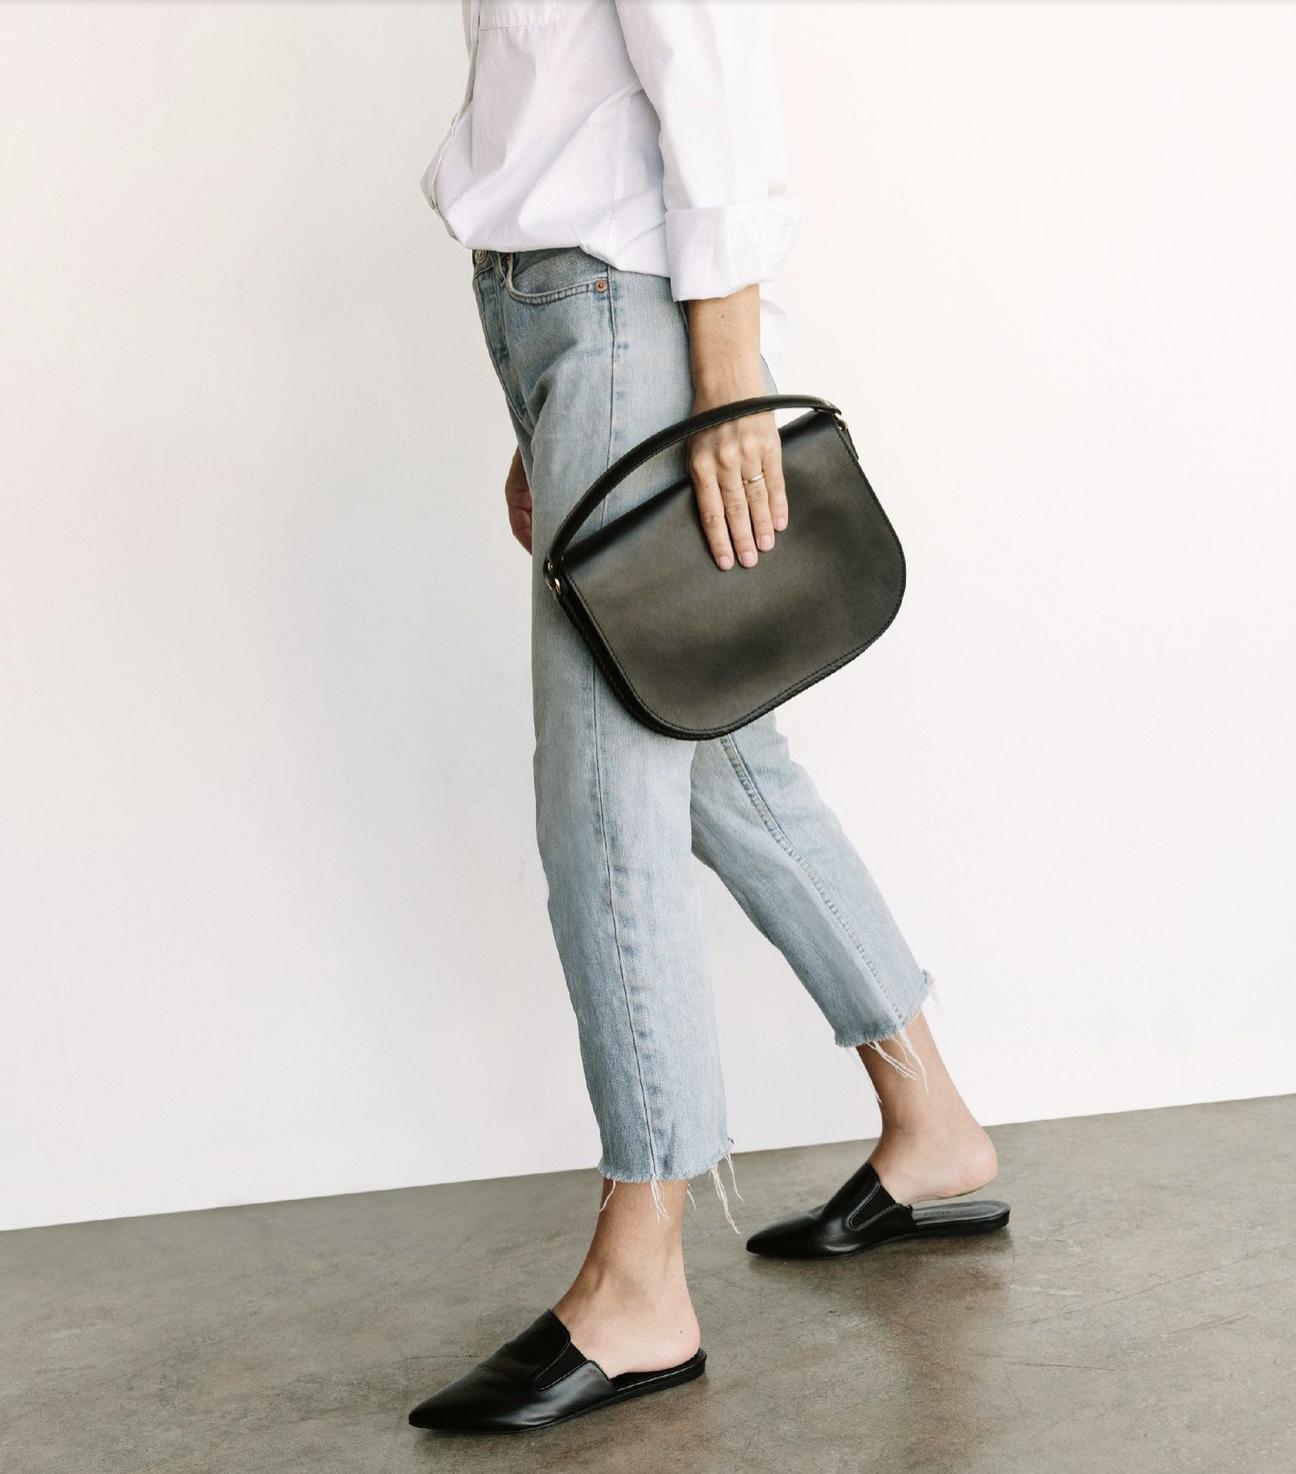 Jenni Kayne mules left, Martiniano shoes right